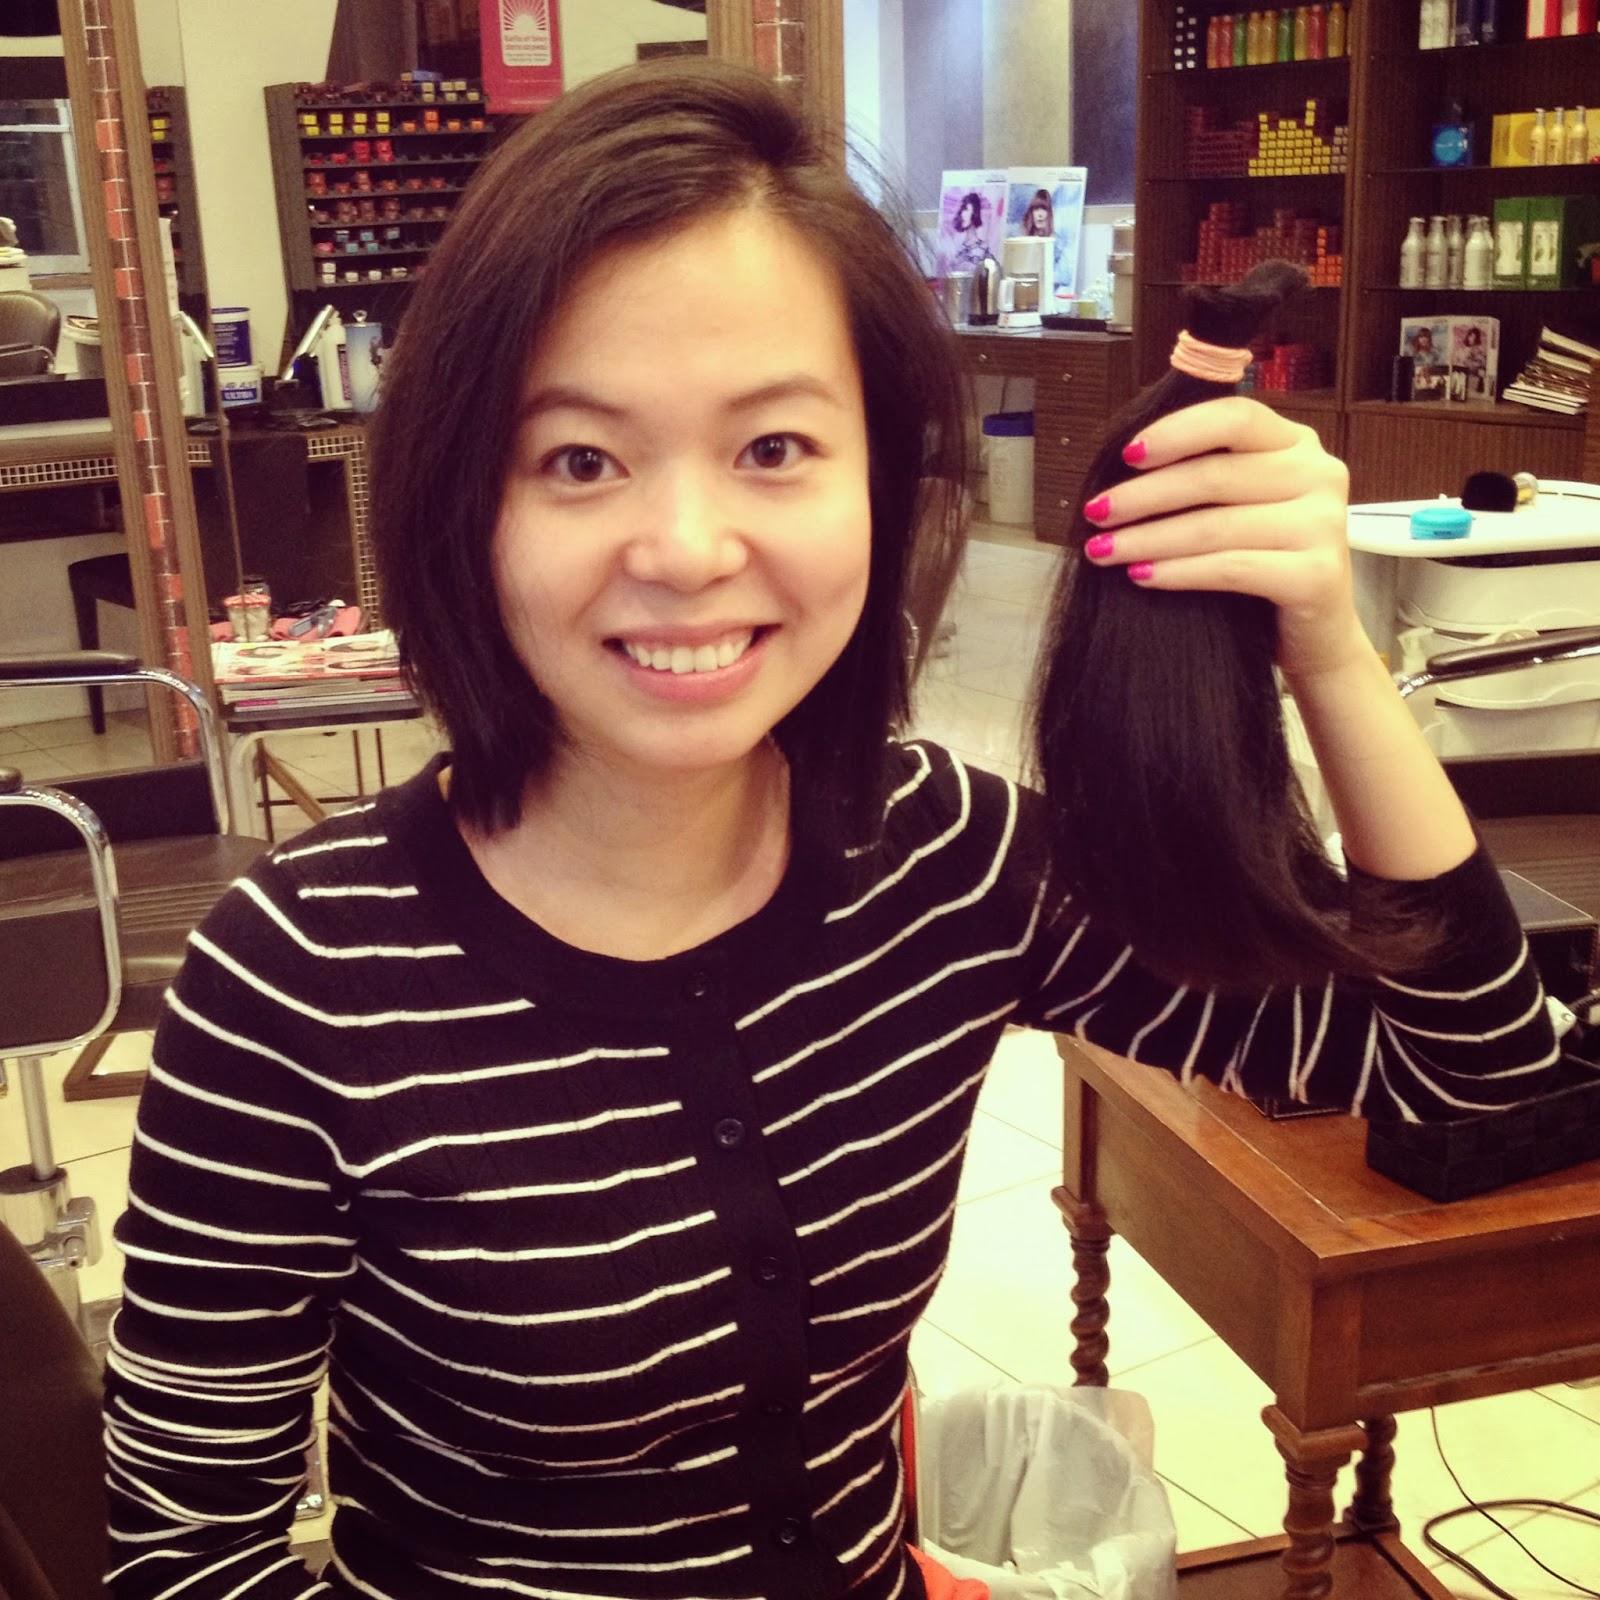 5 Lazy-Girl Hair Hacks Models Always Use 5 Lazy-Girl Hair Hacks Models Always Use new picture